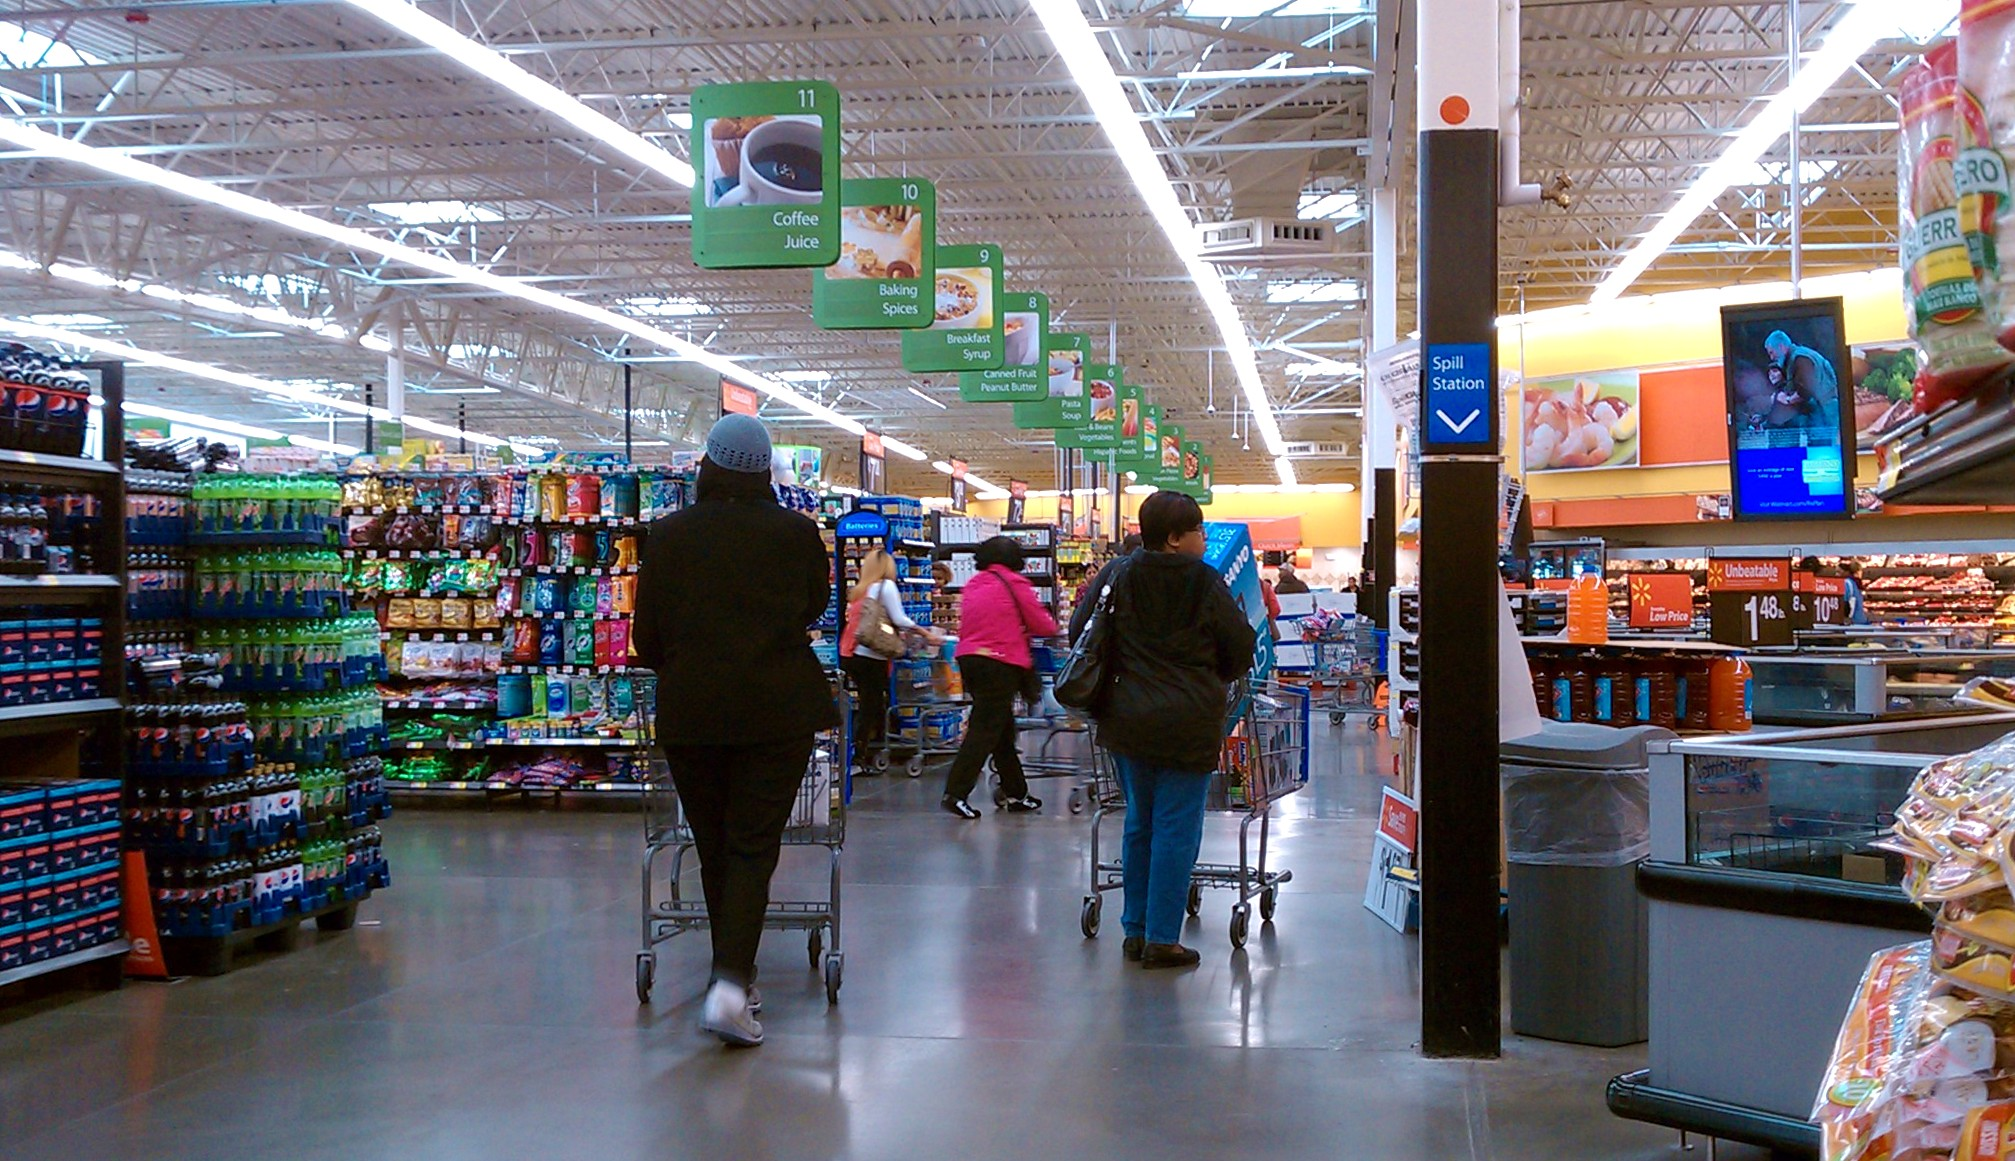 Laurel_Walmart_Grocery_Section.jpg